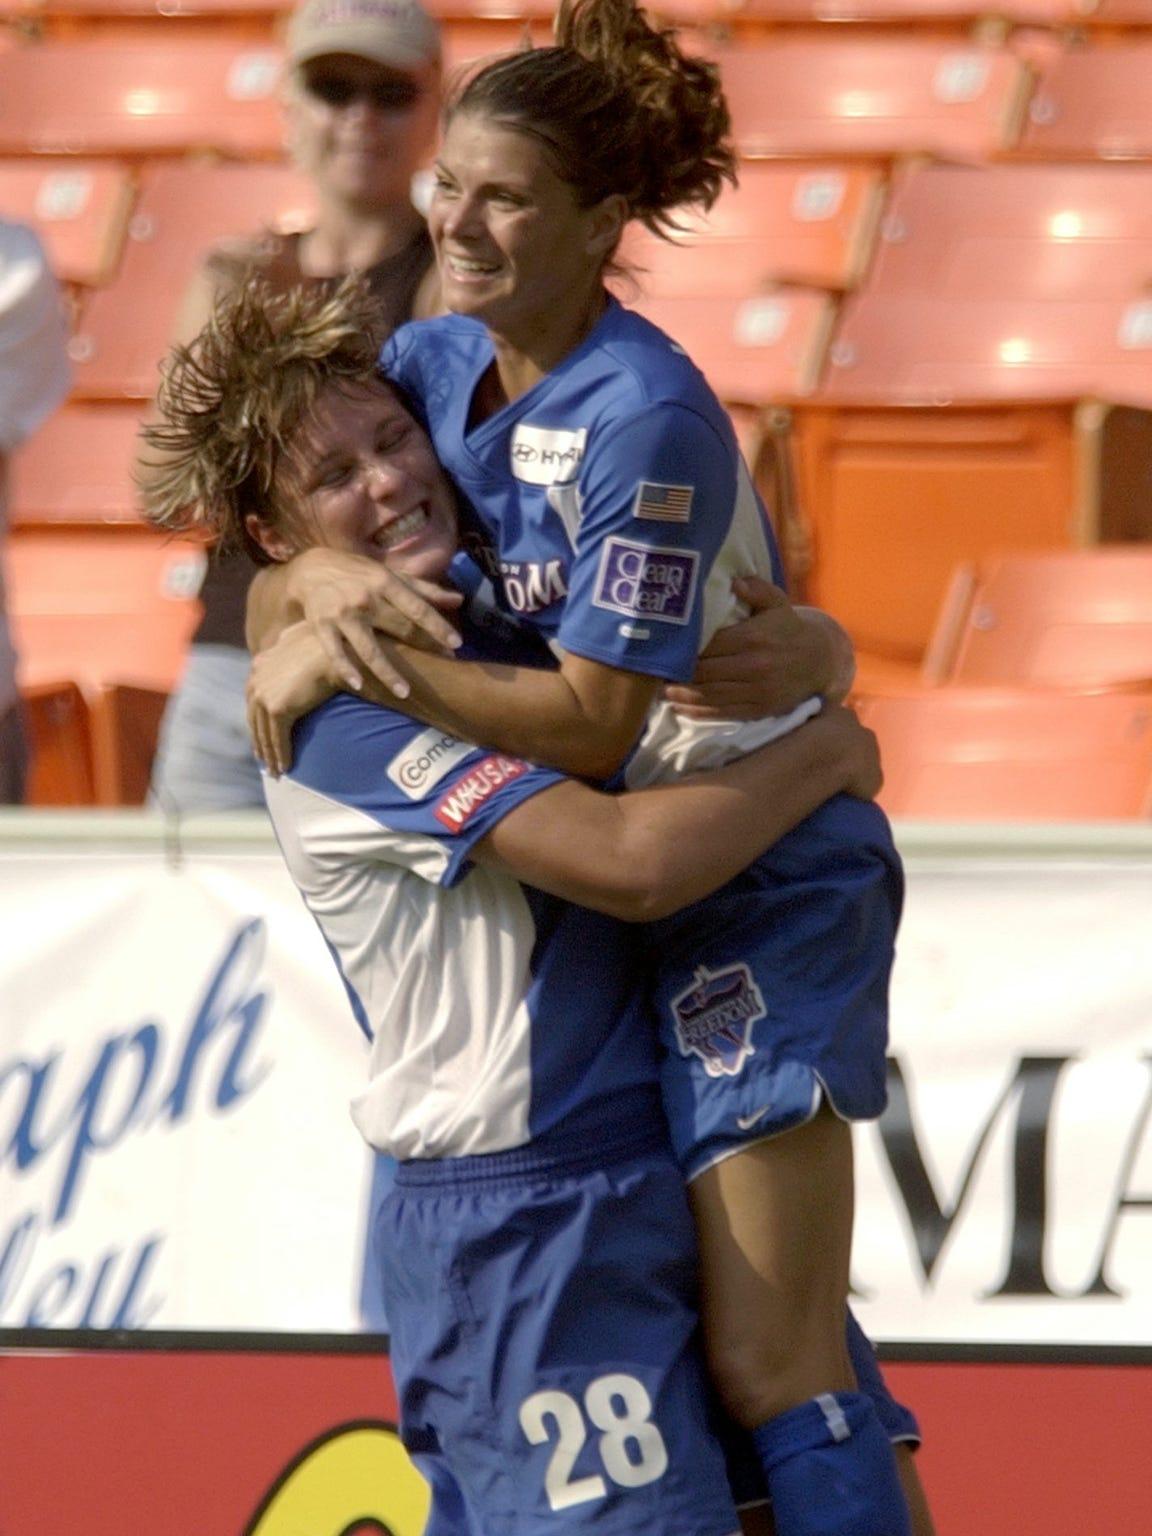 The Washington Freedom's Mia Hamm, right, celebrates a goal with teammate Abby Wambach against the Atlanta Beat at RFK Stadium on Aug. 4, 2002.